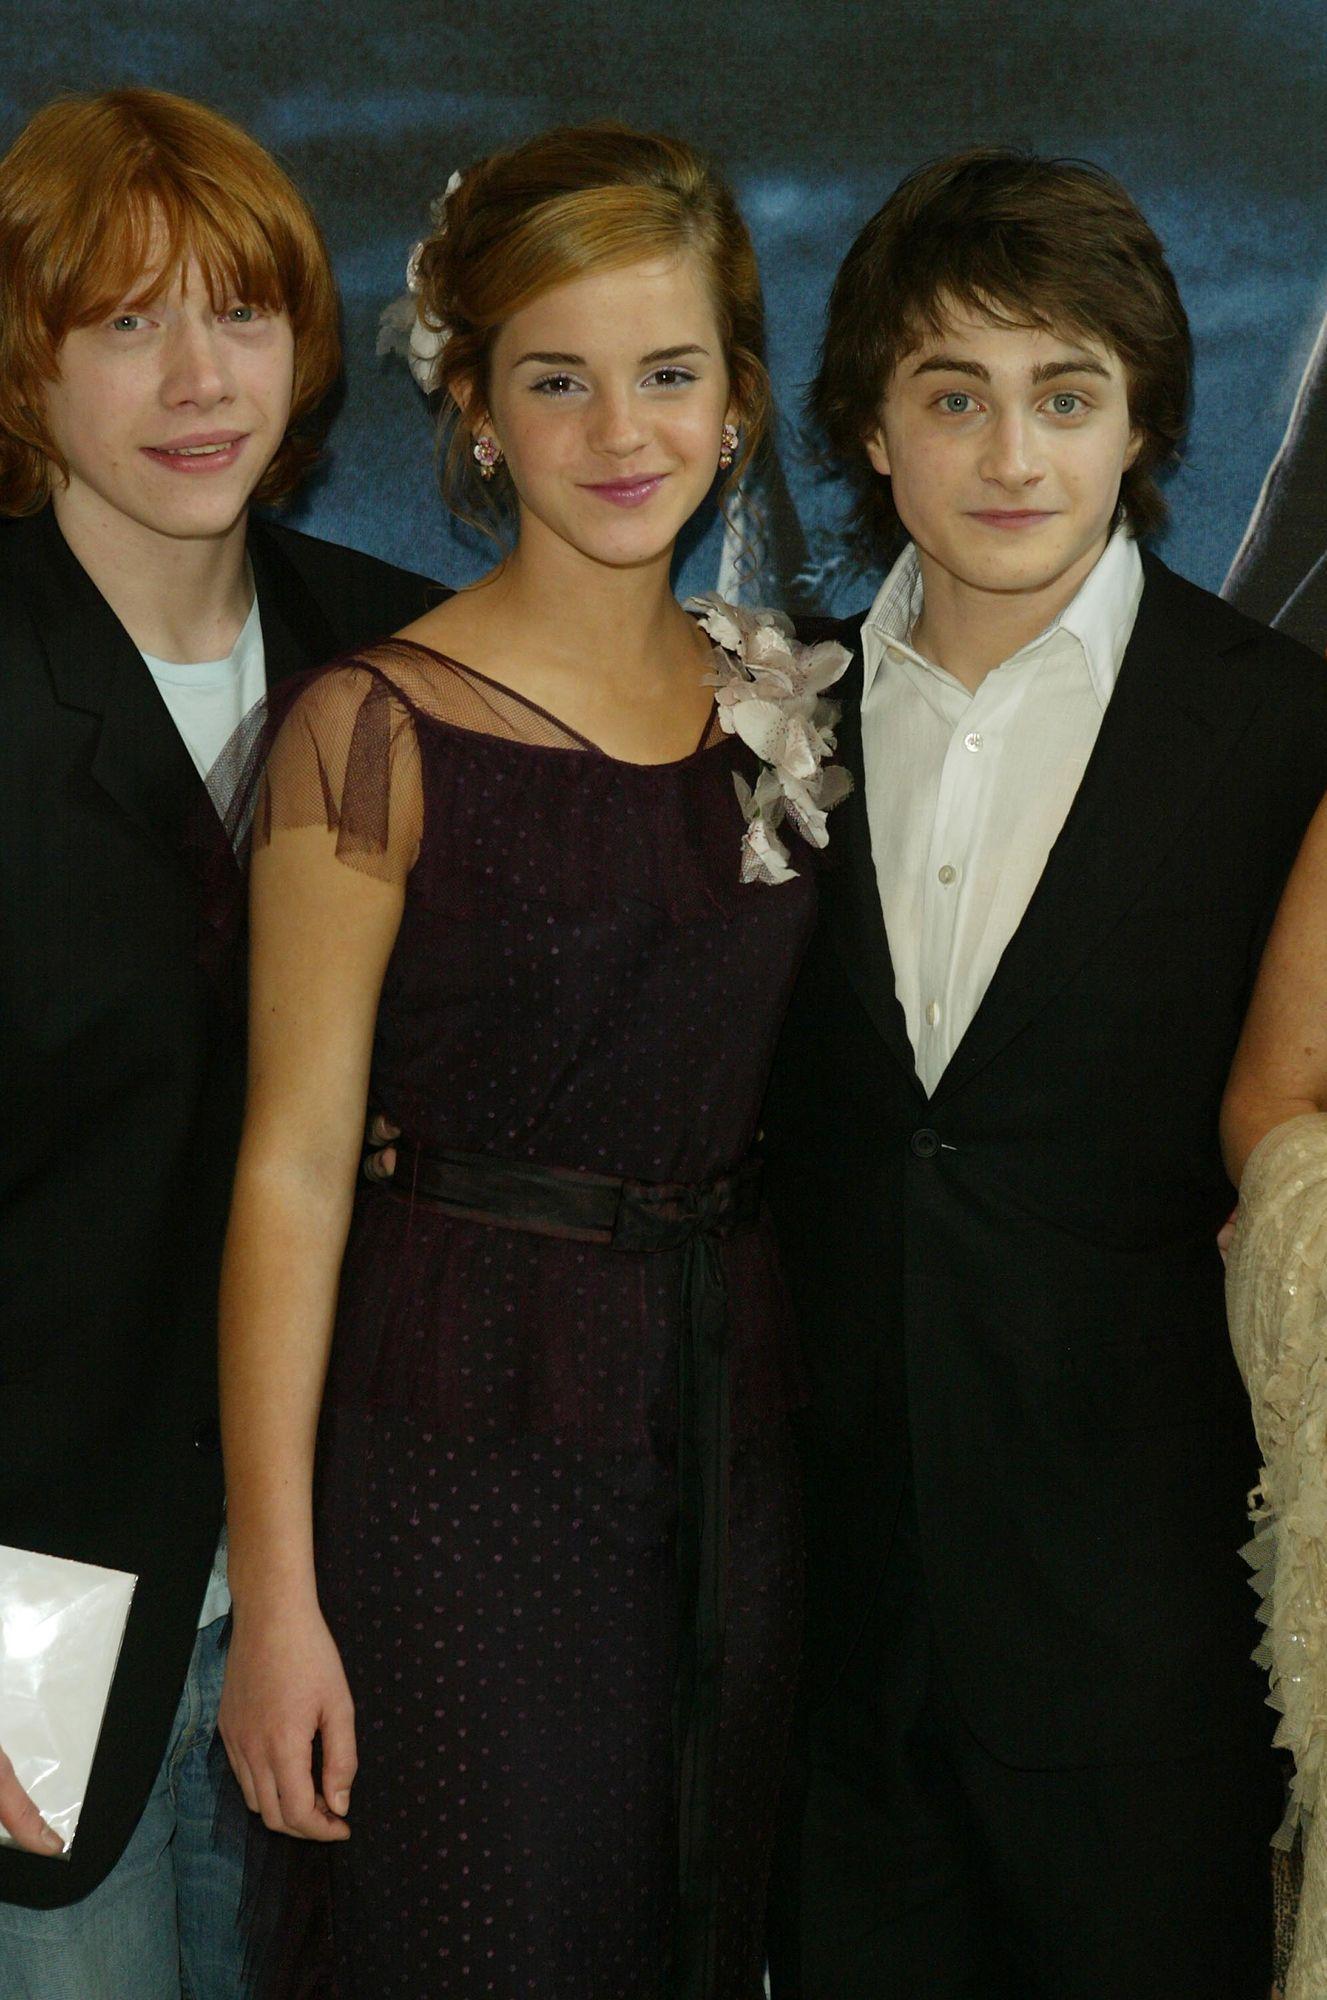 Harry Potter And The Prisoner Of Azkaban Uk Premiere Emma Watson Harry Potter Harry Potter Actors Harry Potter Movies